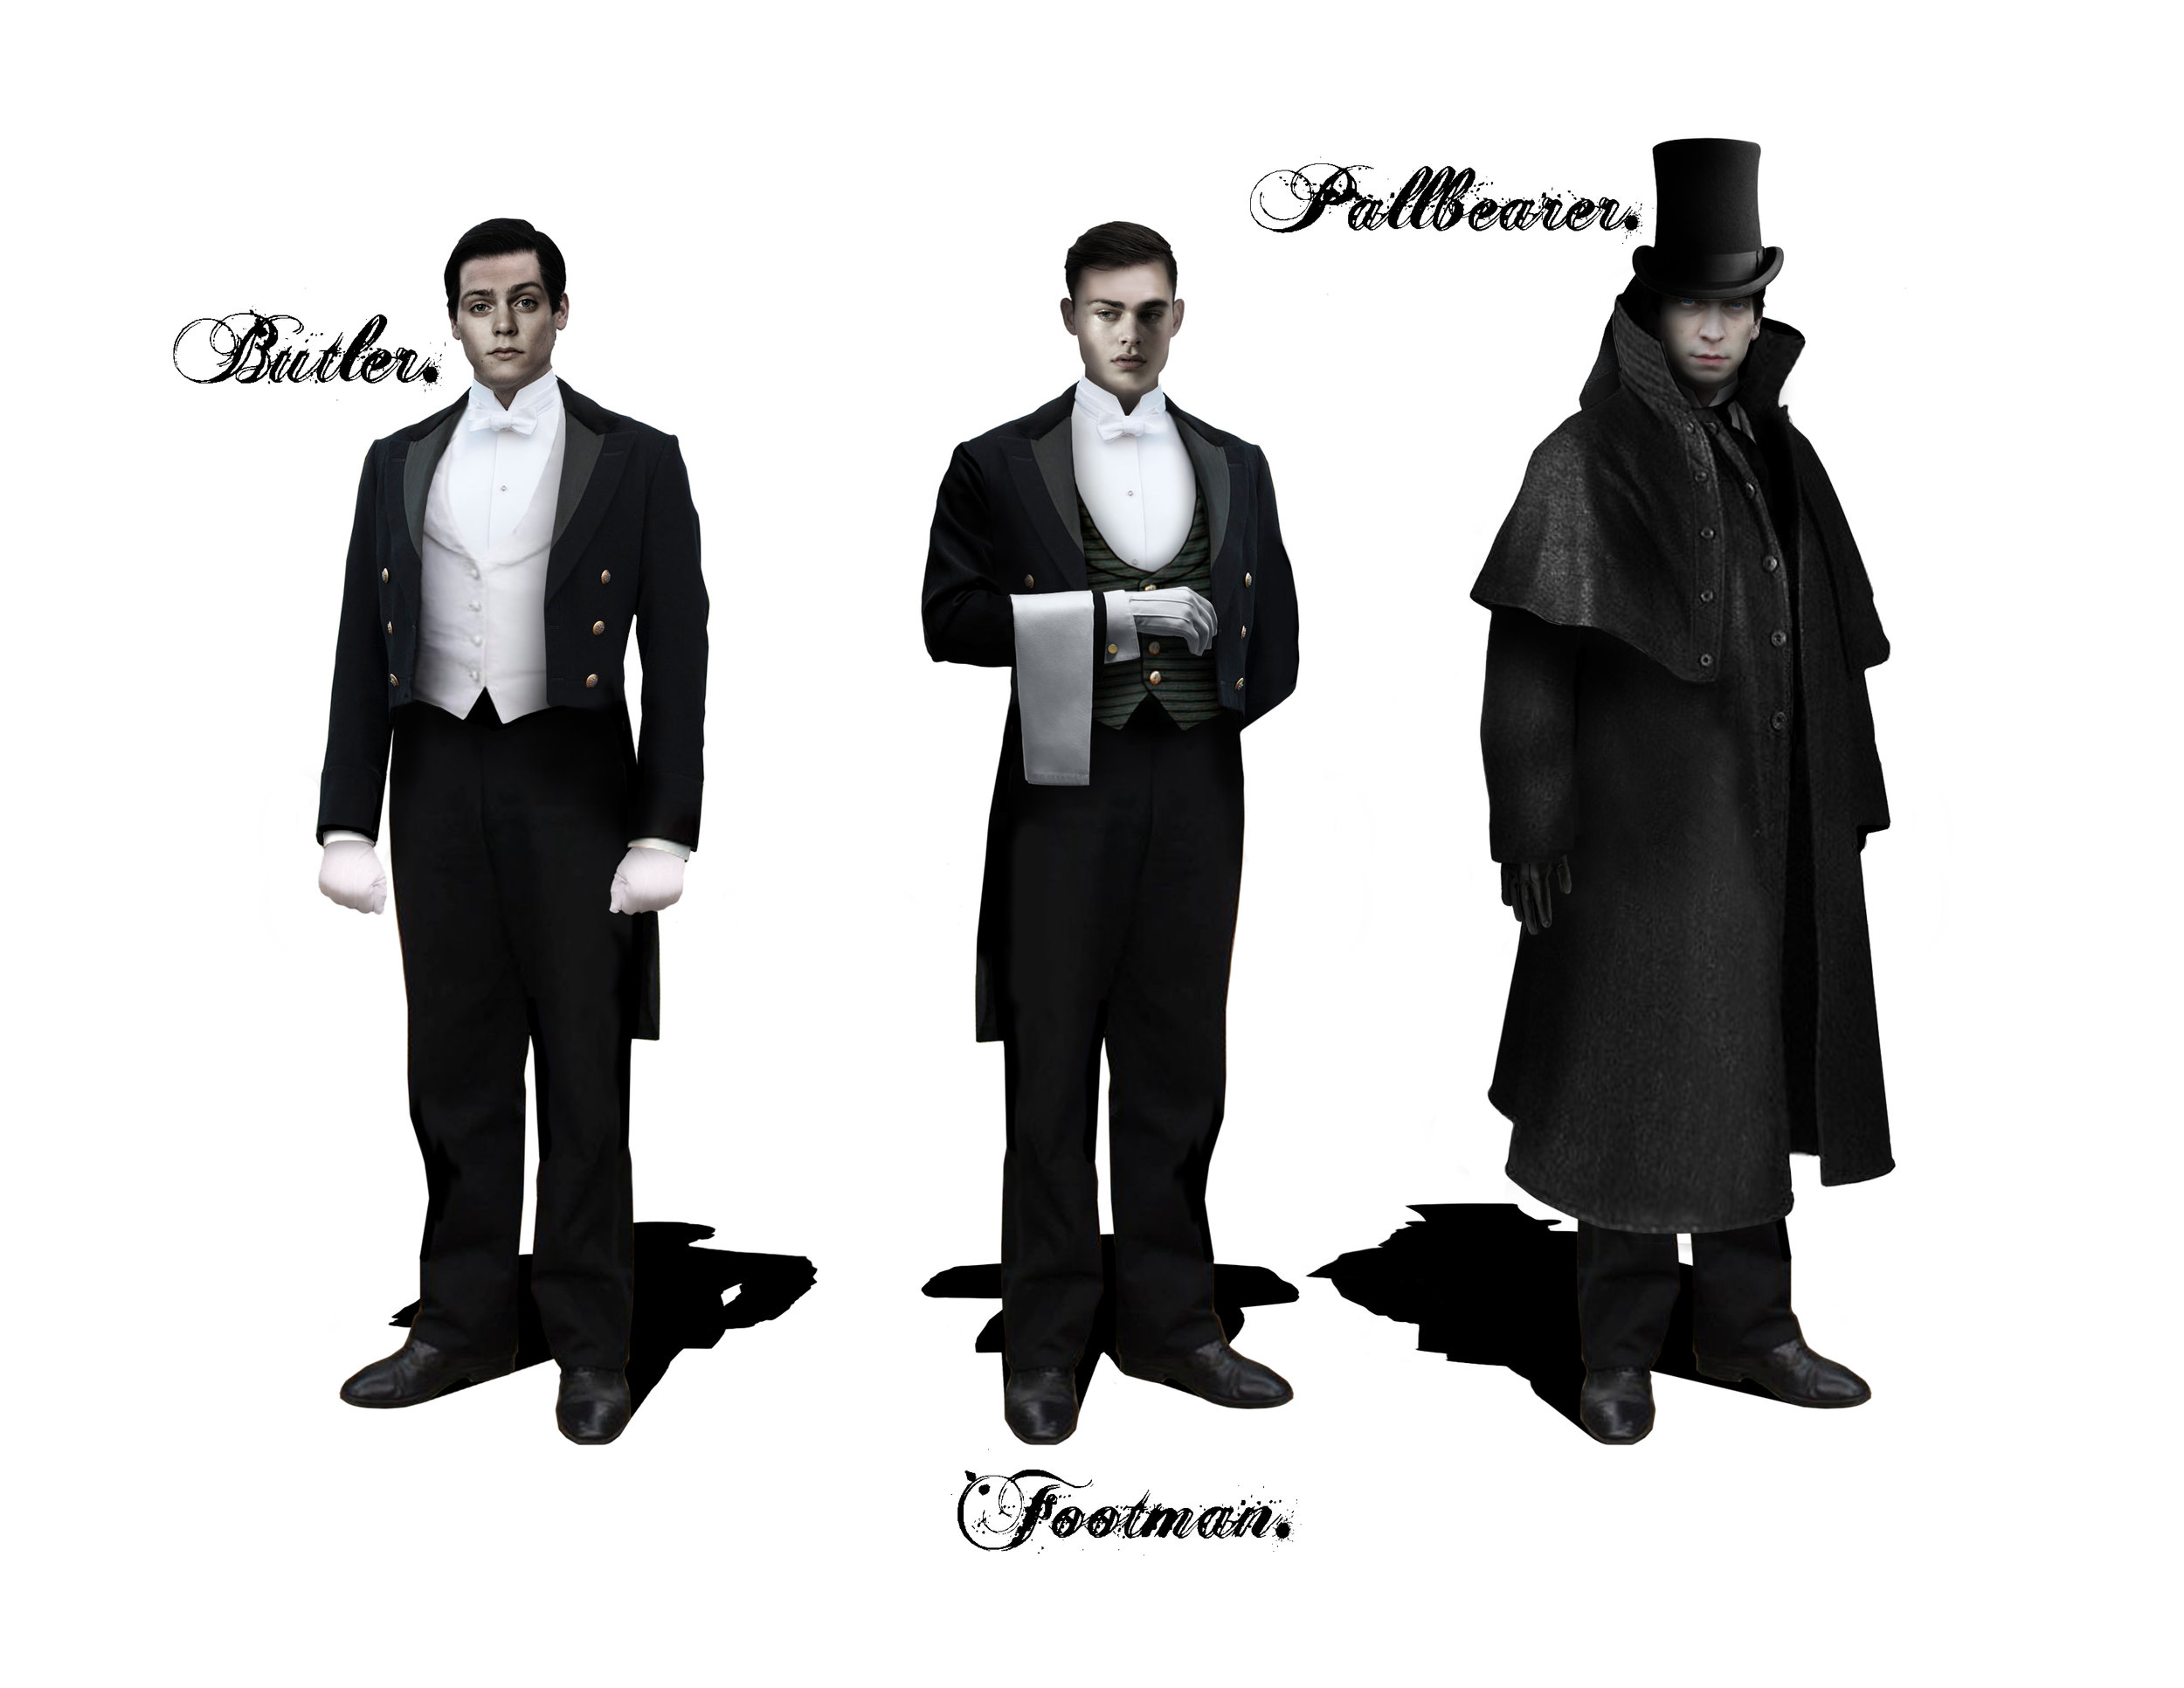 BUTLERS & PALLBEARER - Costume Designs